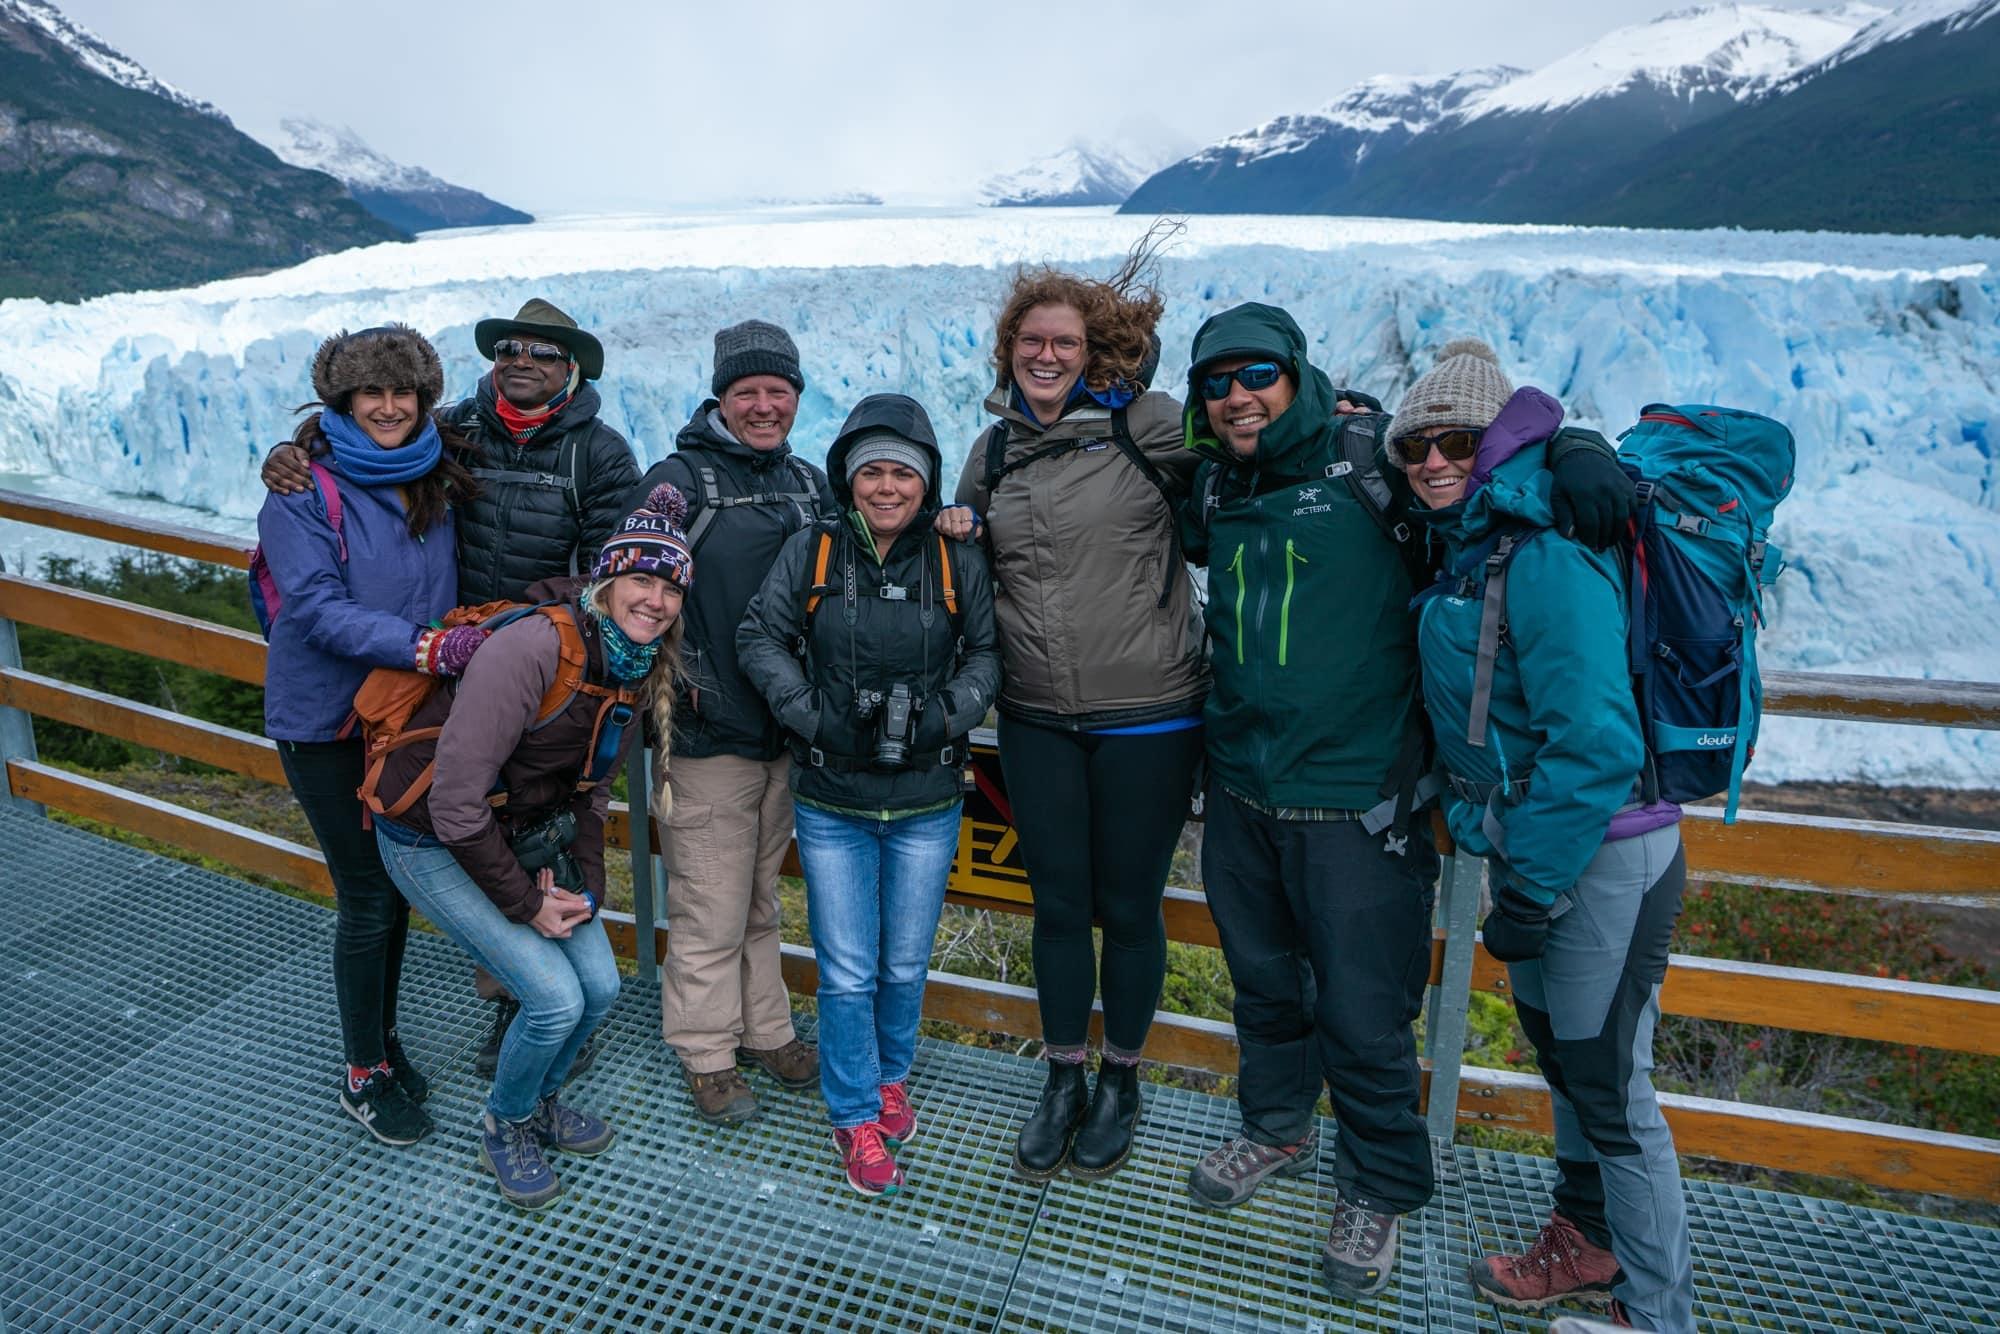 Walking the boardwalk at Perito Moreno Glacier in El Calafate, Argentina (Patagonia)